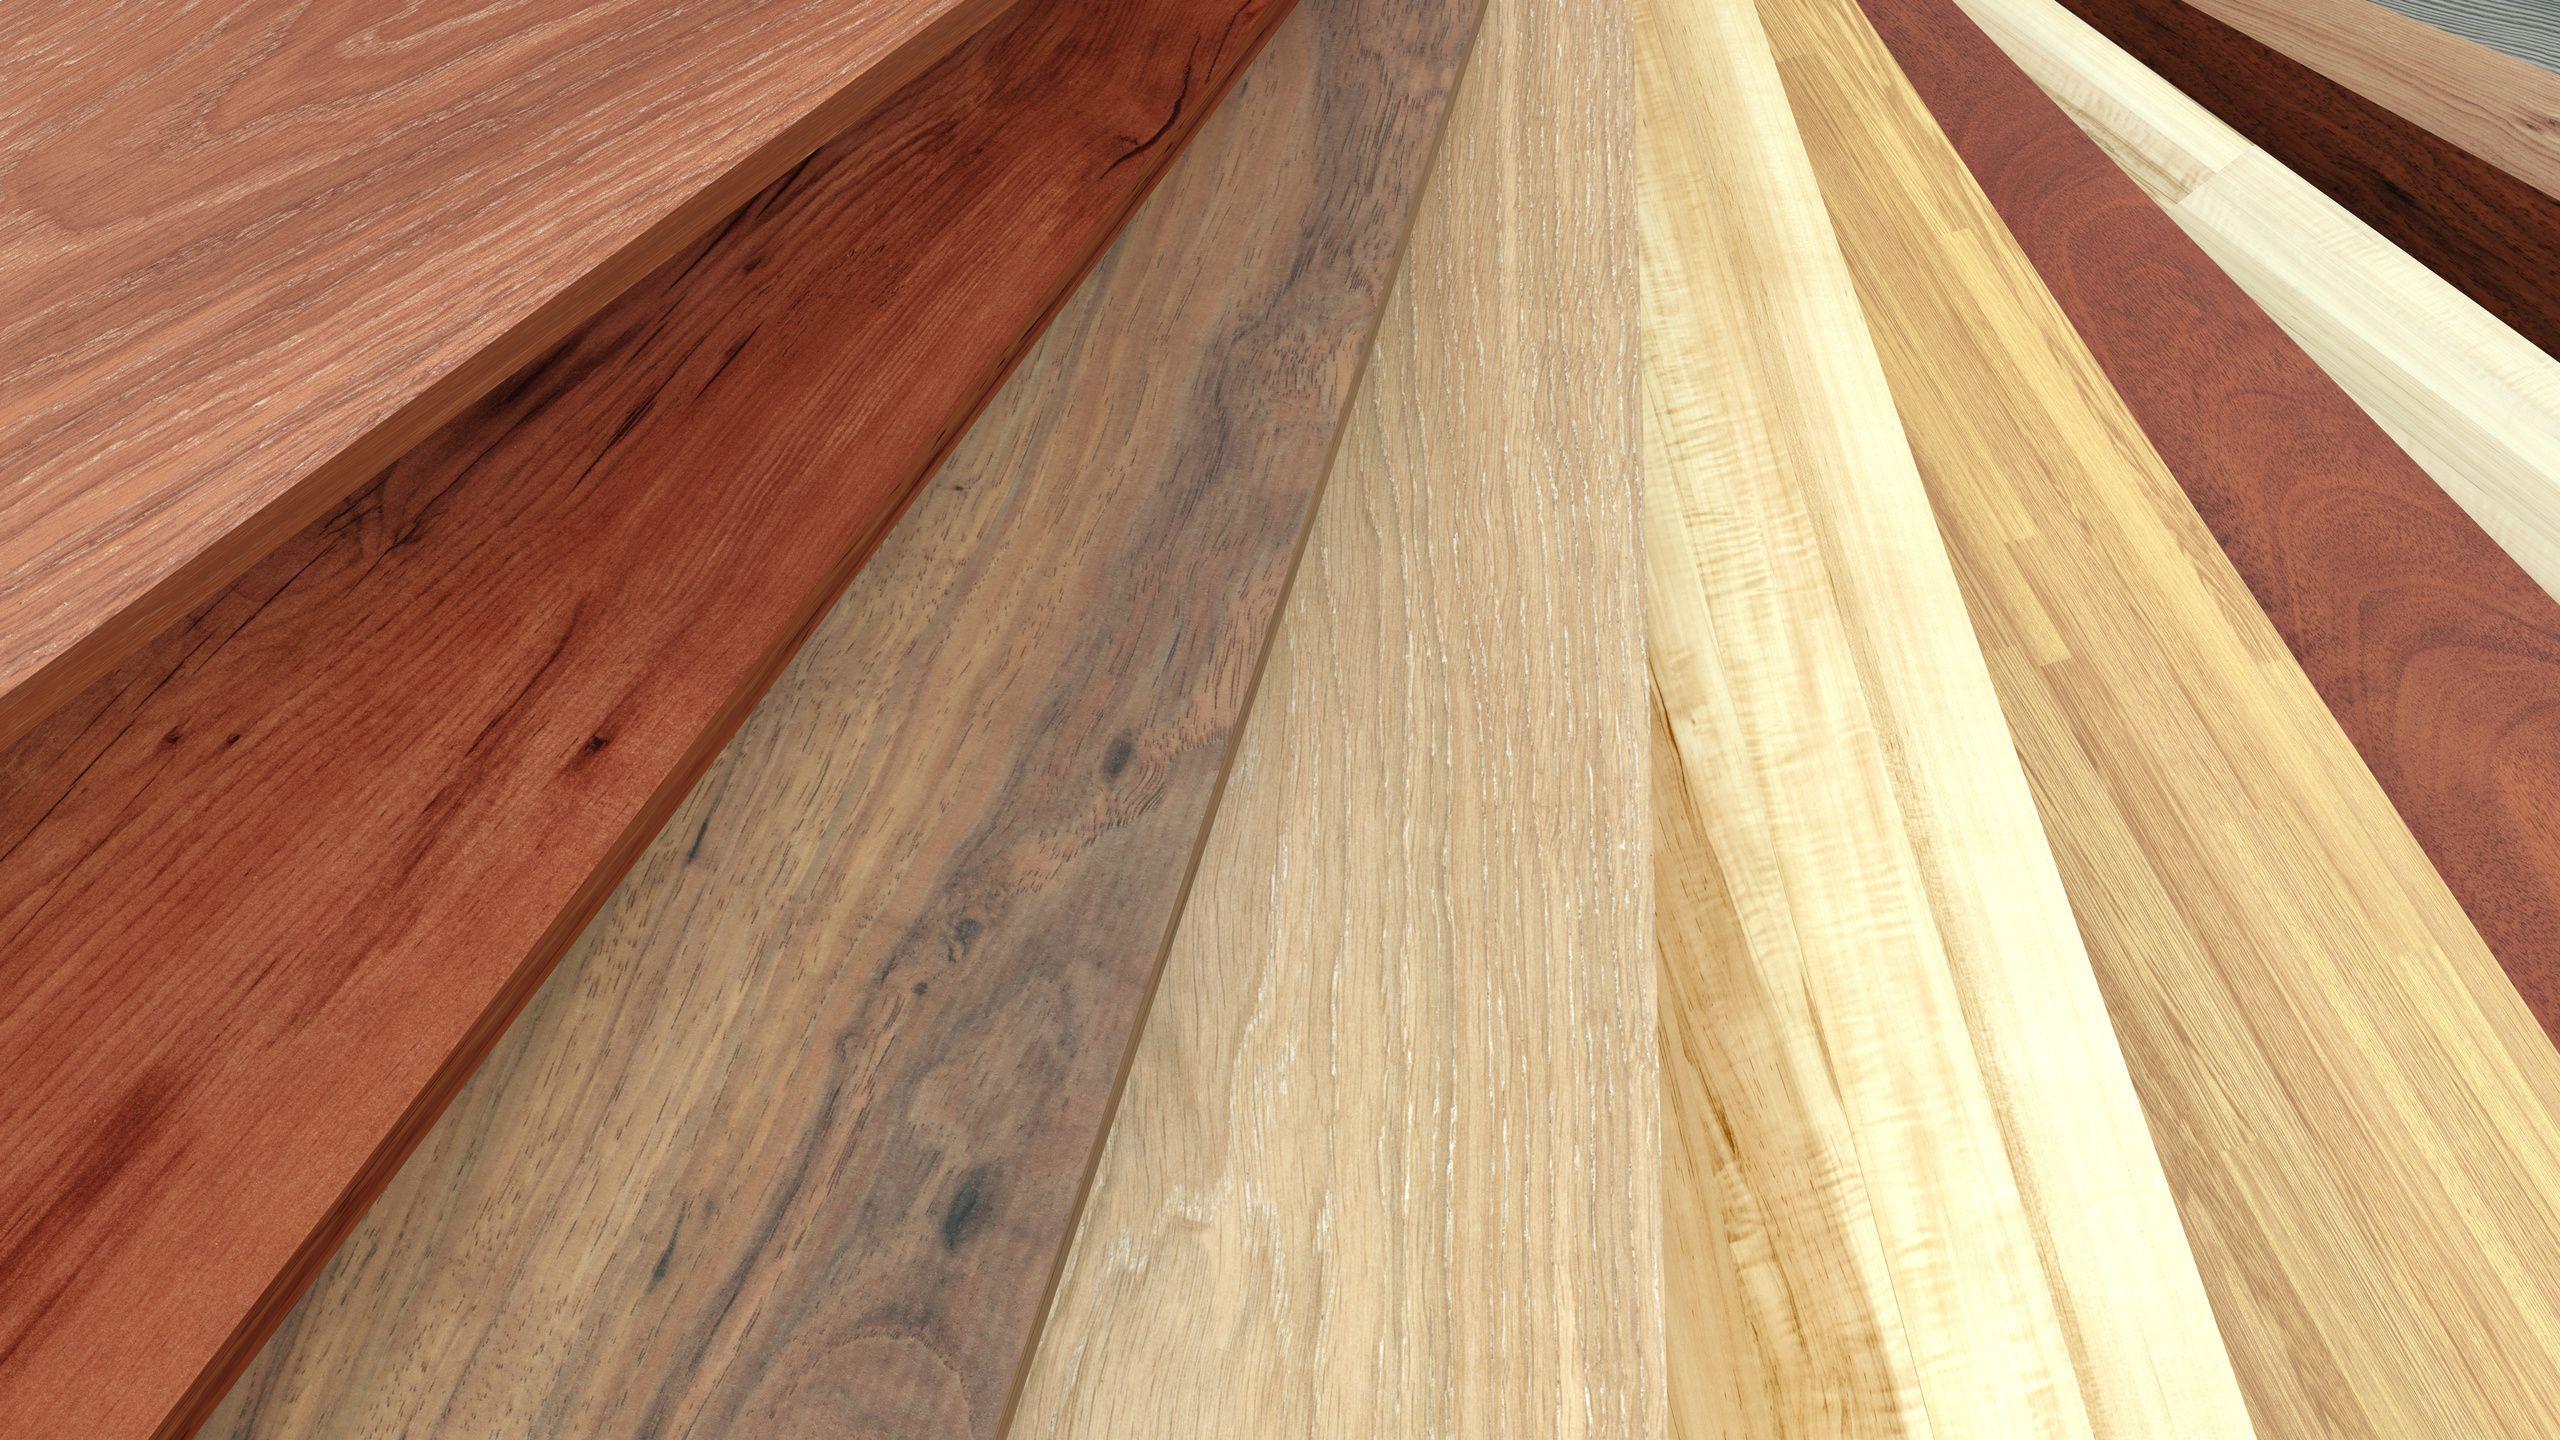 hardwood floor refinishing lehigh valley pa of rs hardwood flooring co inc throughout 56629e2982bd44963e30c610eeb48dd5a55aab61bddd598fd66aa3e74b47cec8